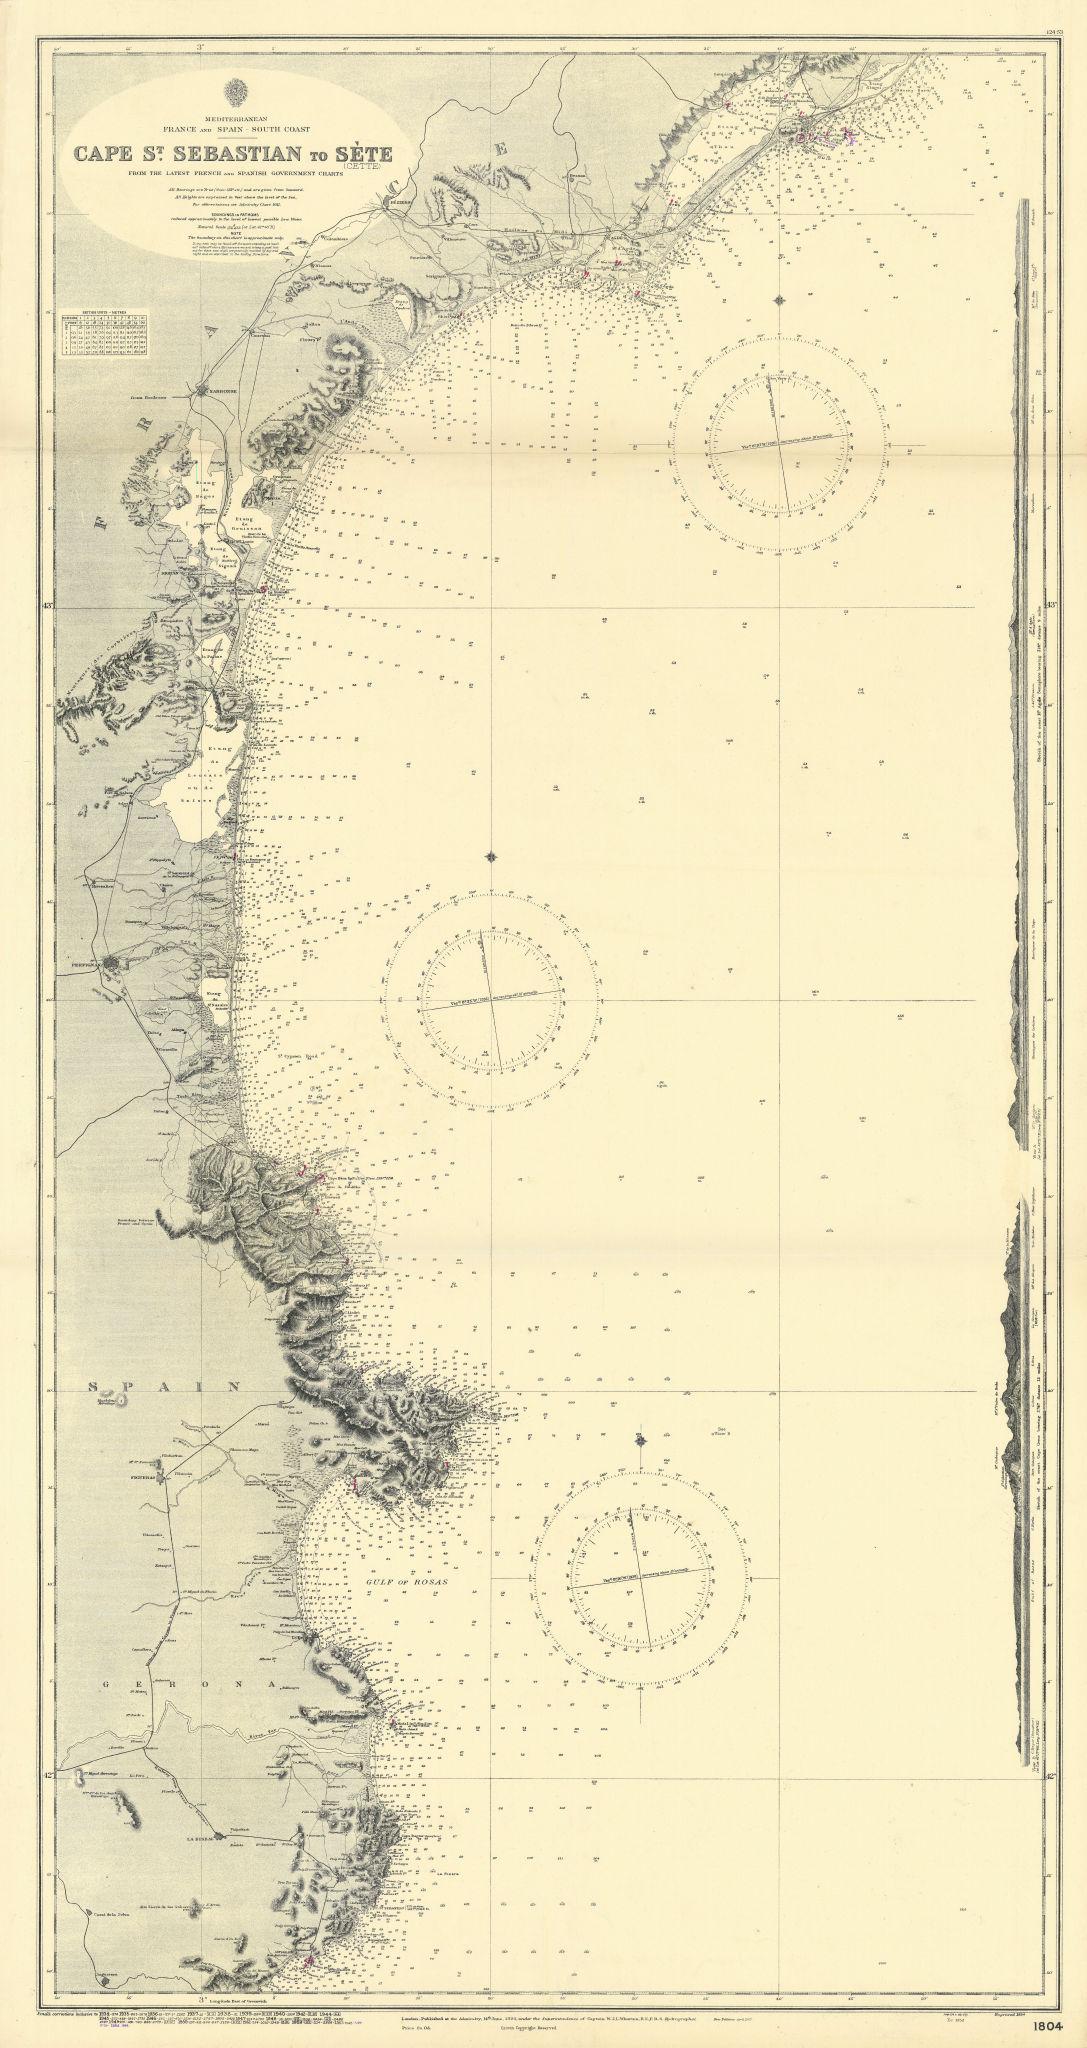 Occitanie North Catalunya coast Palamos-Sète ADMIRALTY sea chart 1894 (1954) map